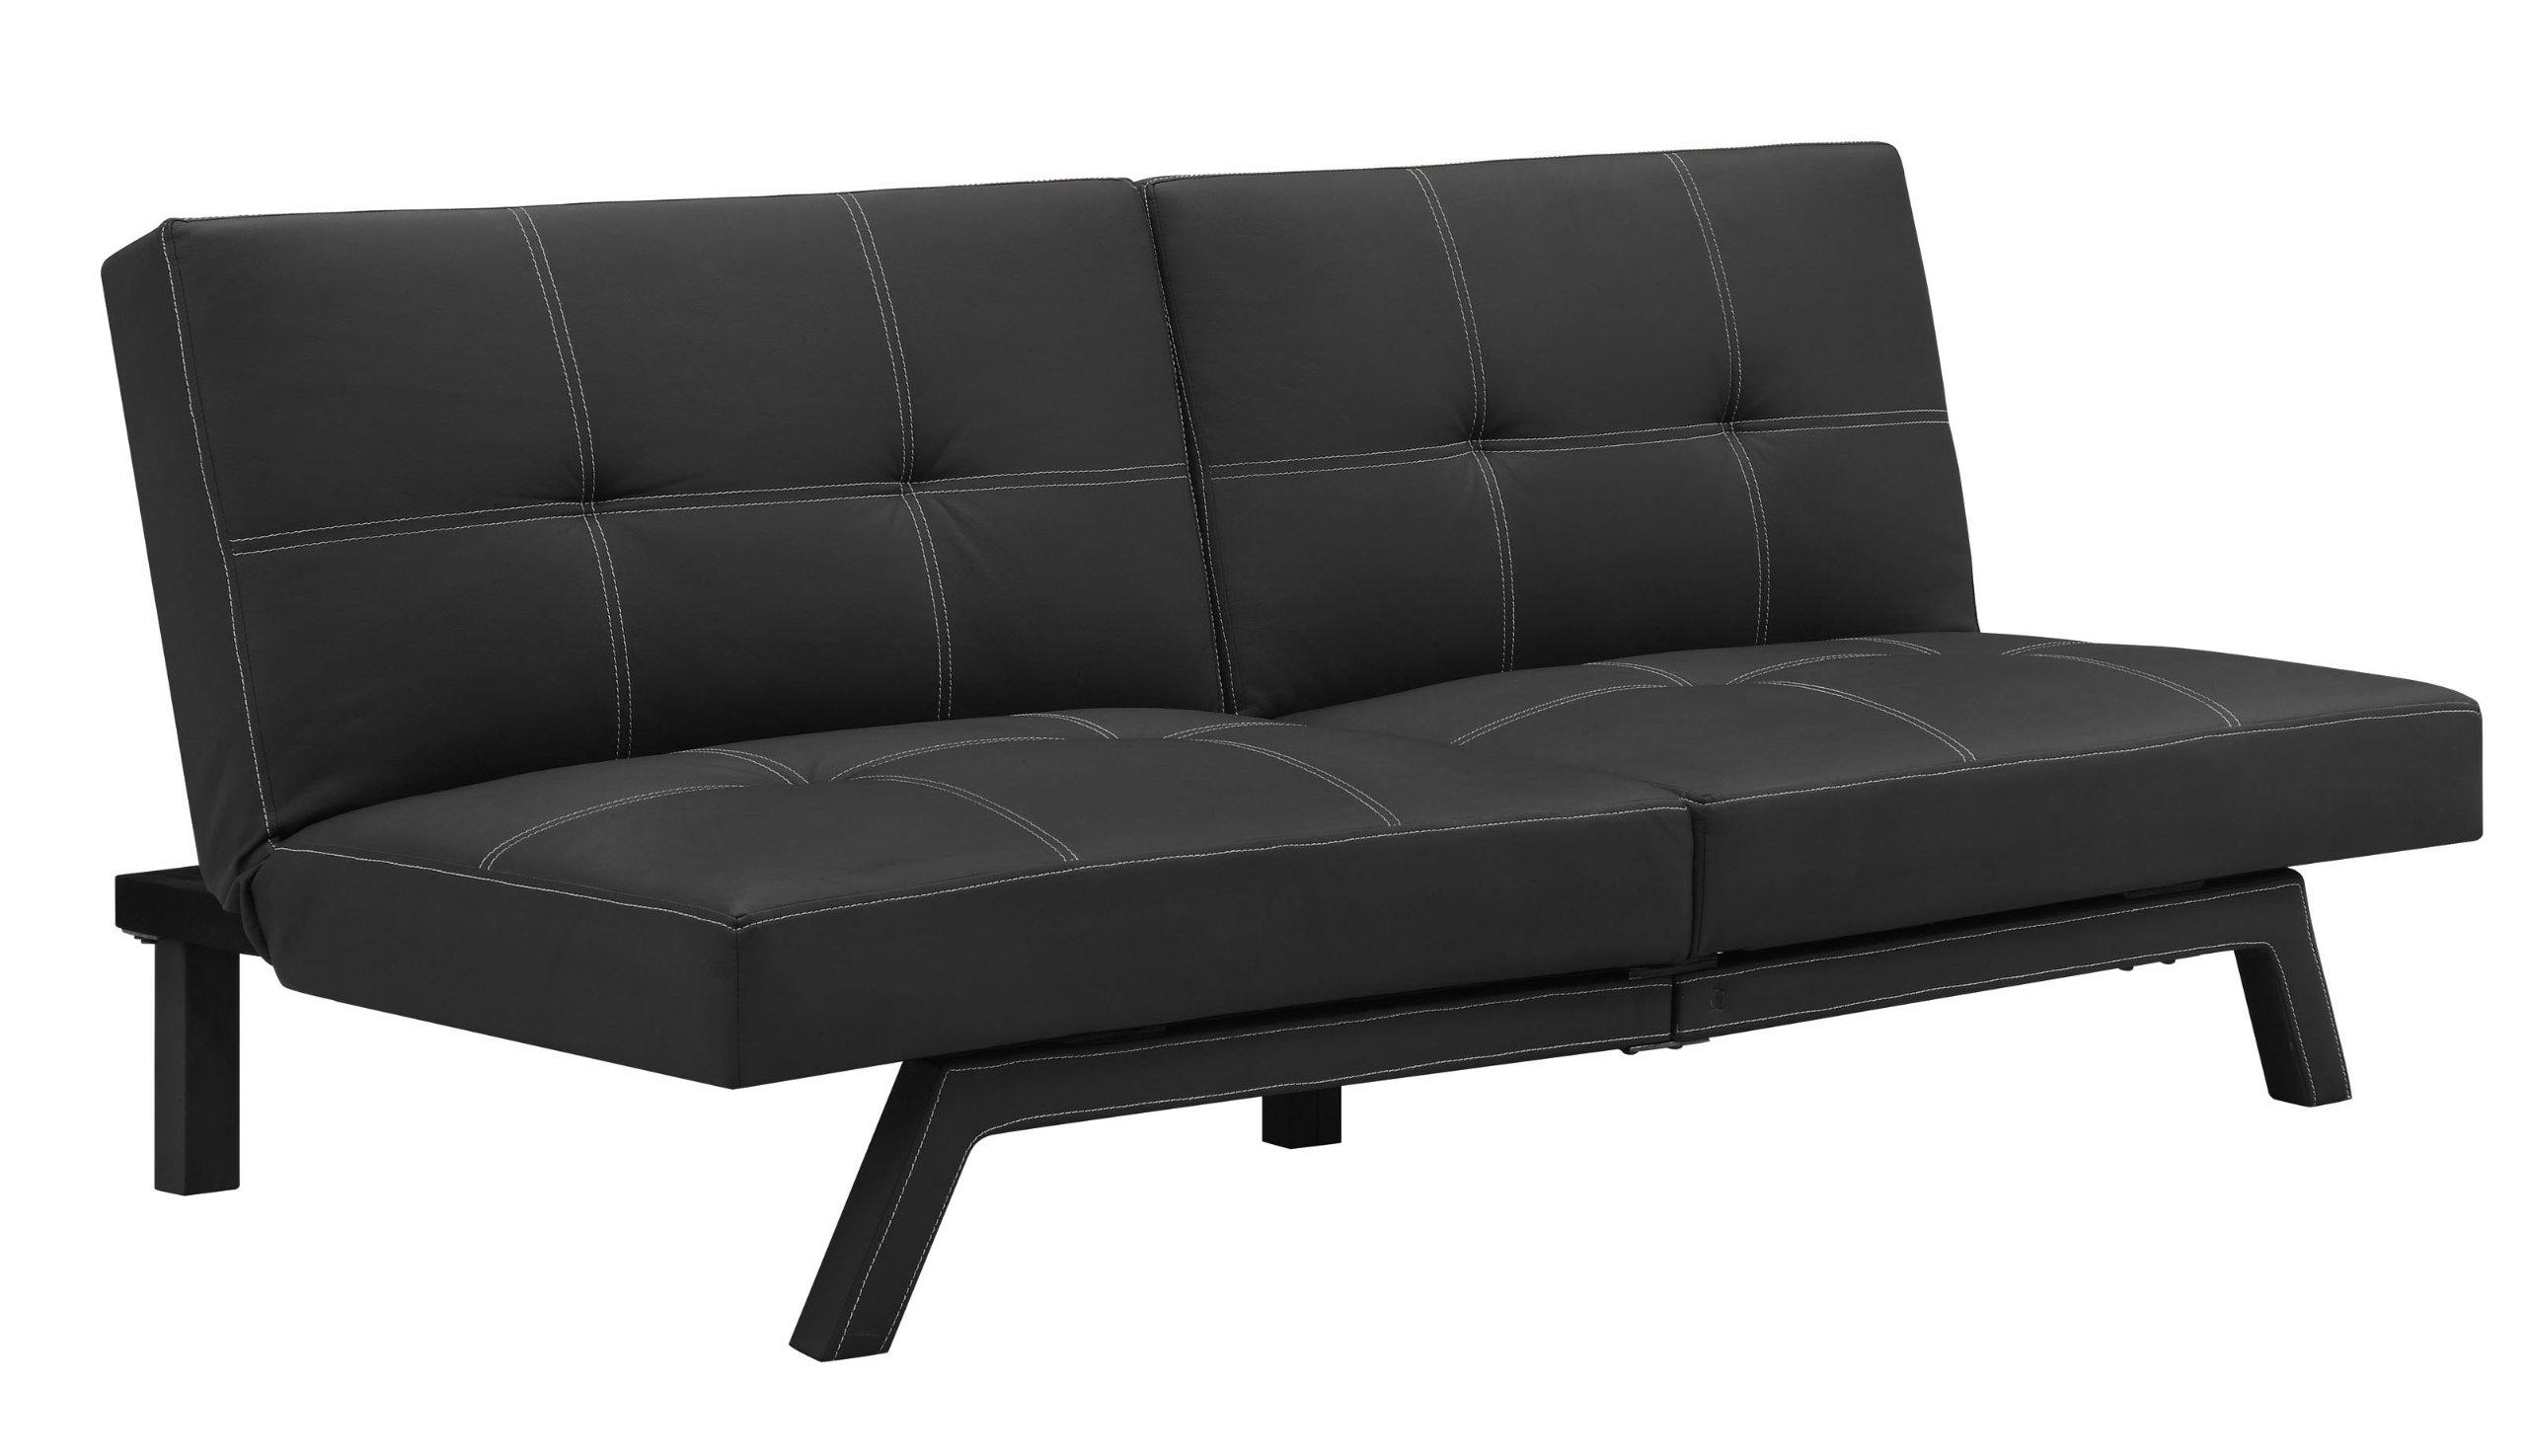 DHP Delaney Splitback Futon Compact Modern Design, Black Faux Leather